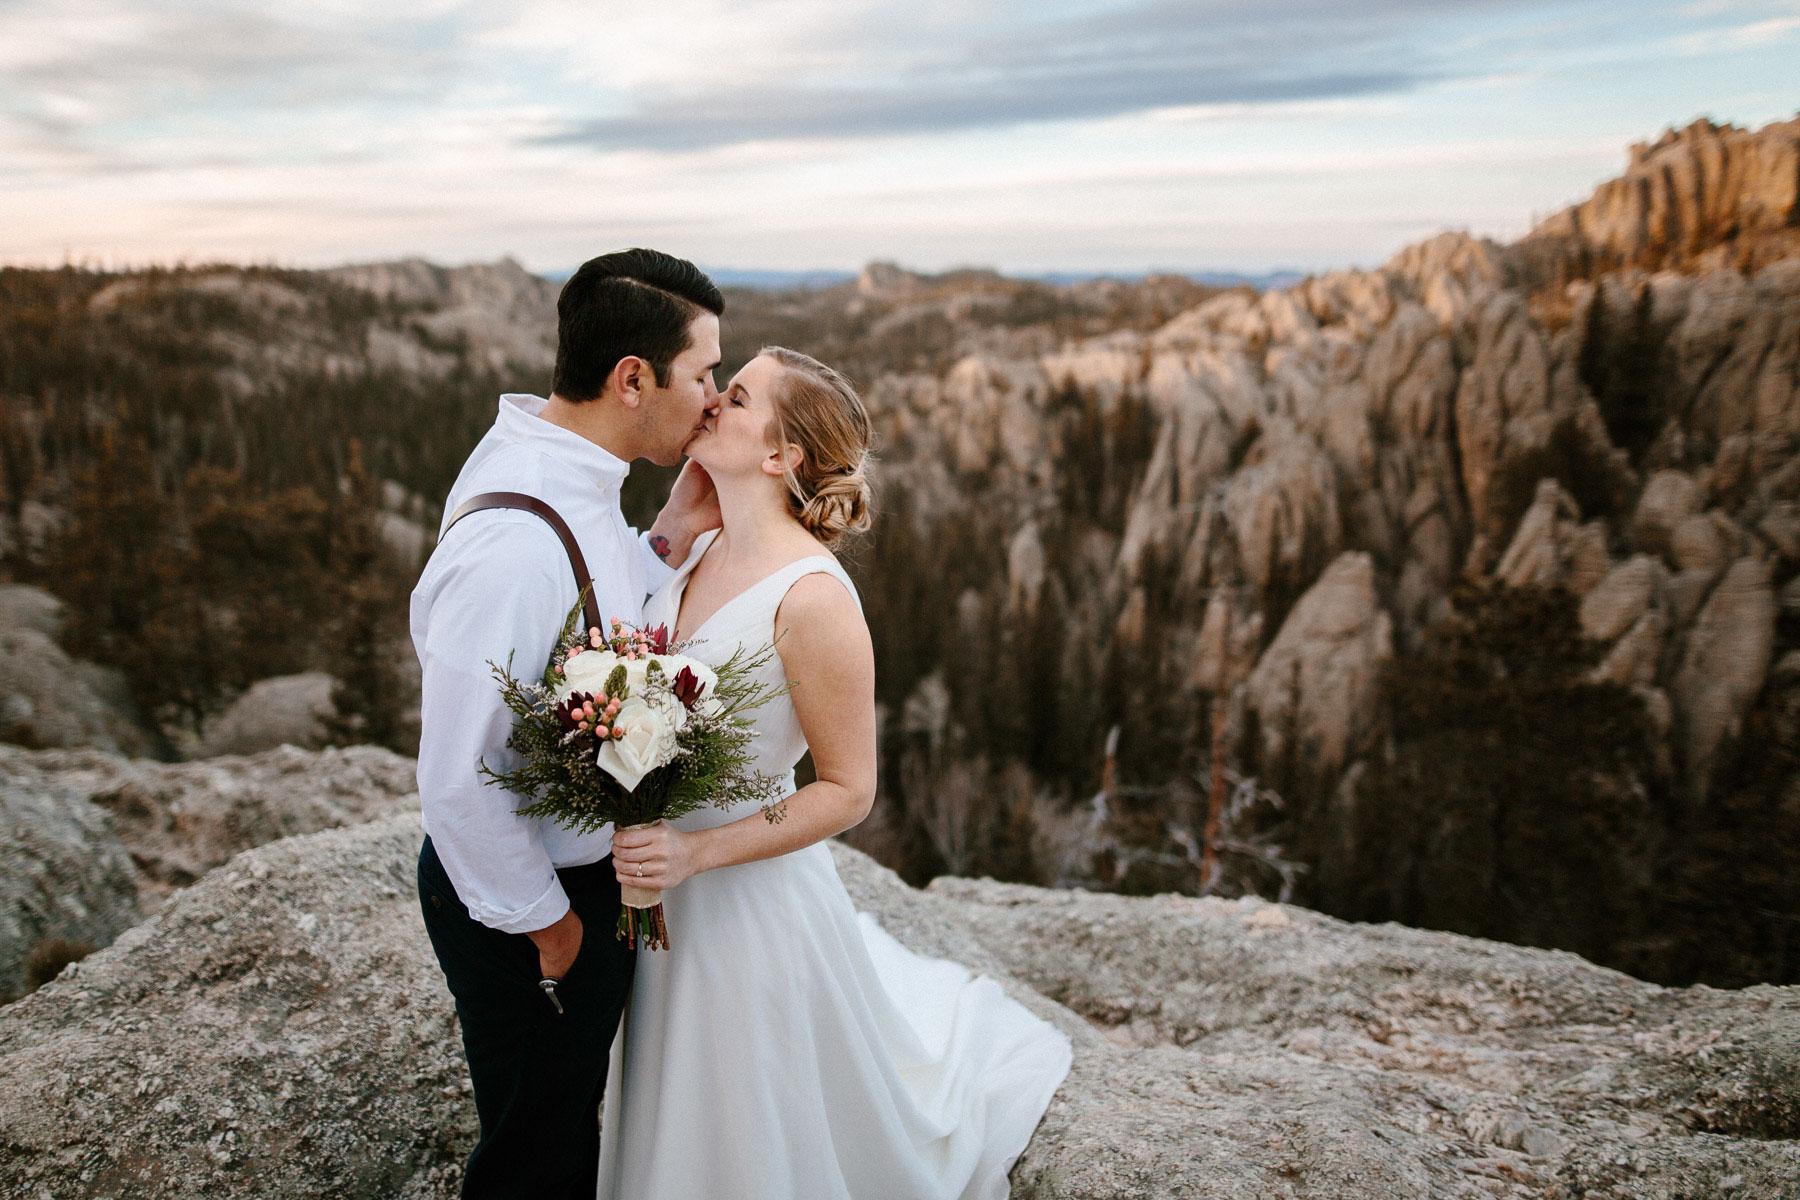 sioux-falls-black-hills-rapid-city-elopement-wedding-adventure-photographer-custer-sylvan-lake-48.jpg